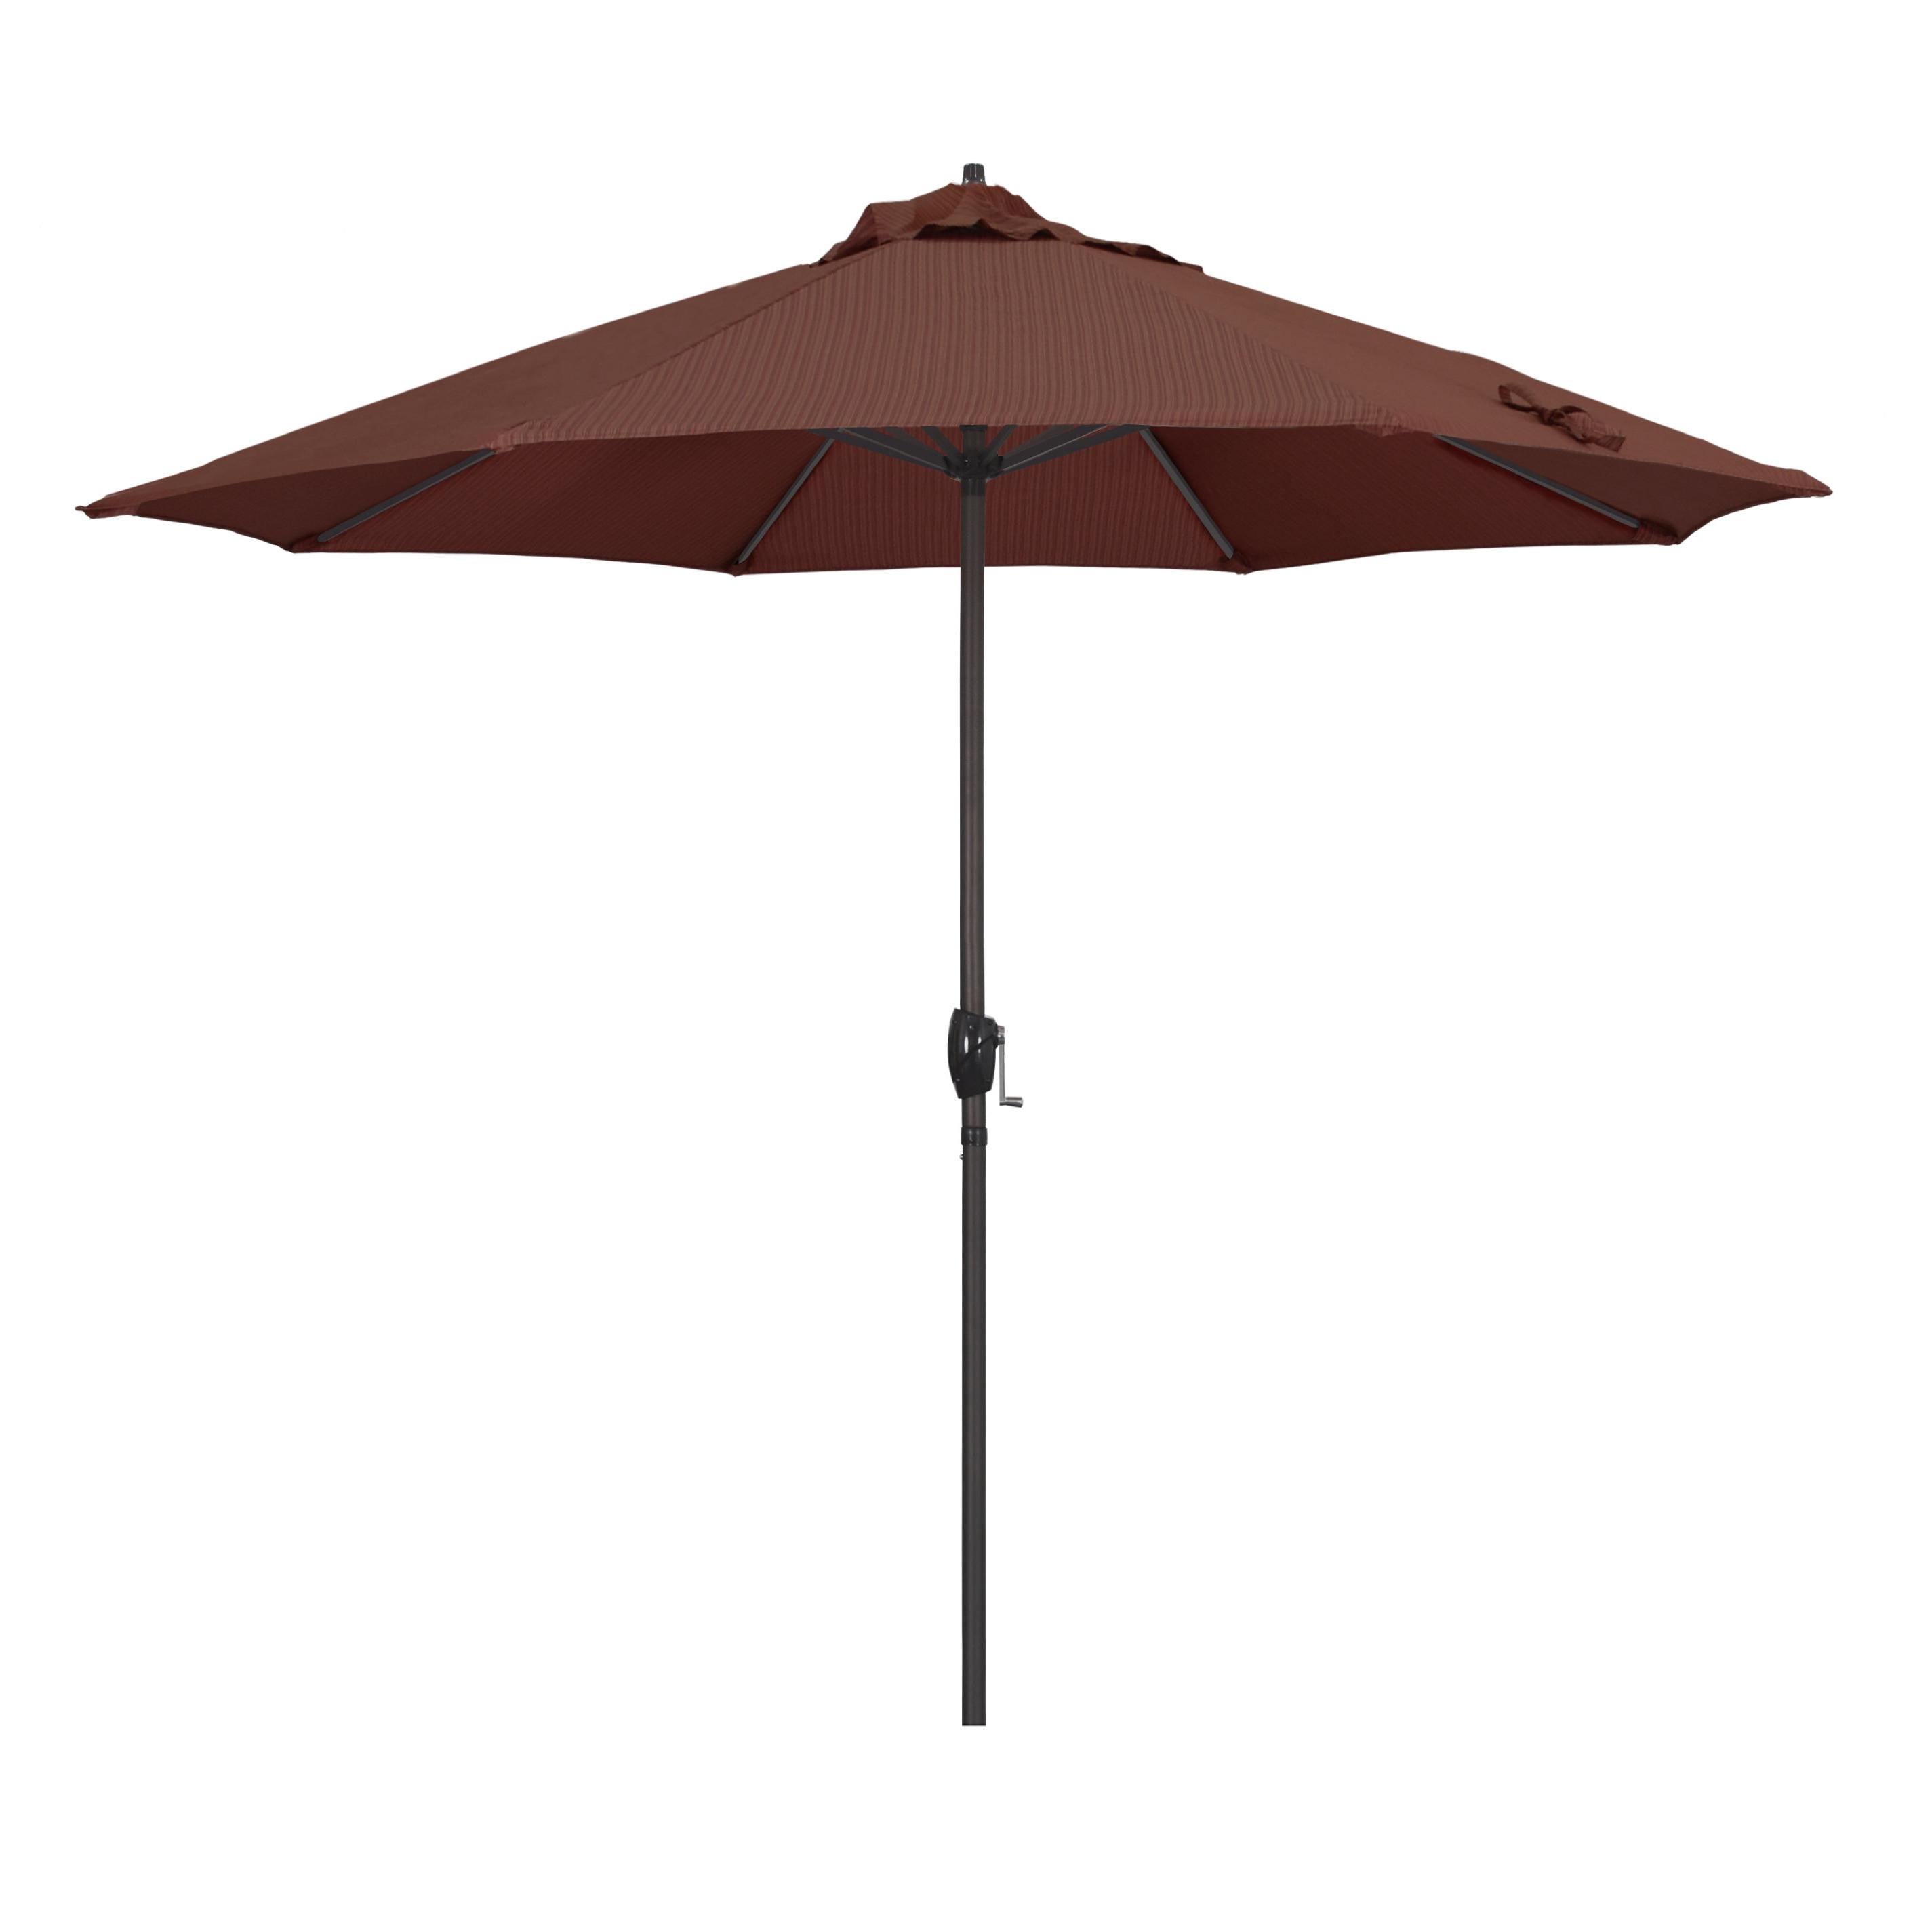 Caravelle Market Umbrellas Pertaining To Most Recent Cardine 9' Market Umbrella (View 7 of 20)